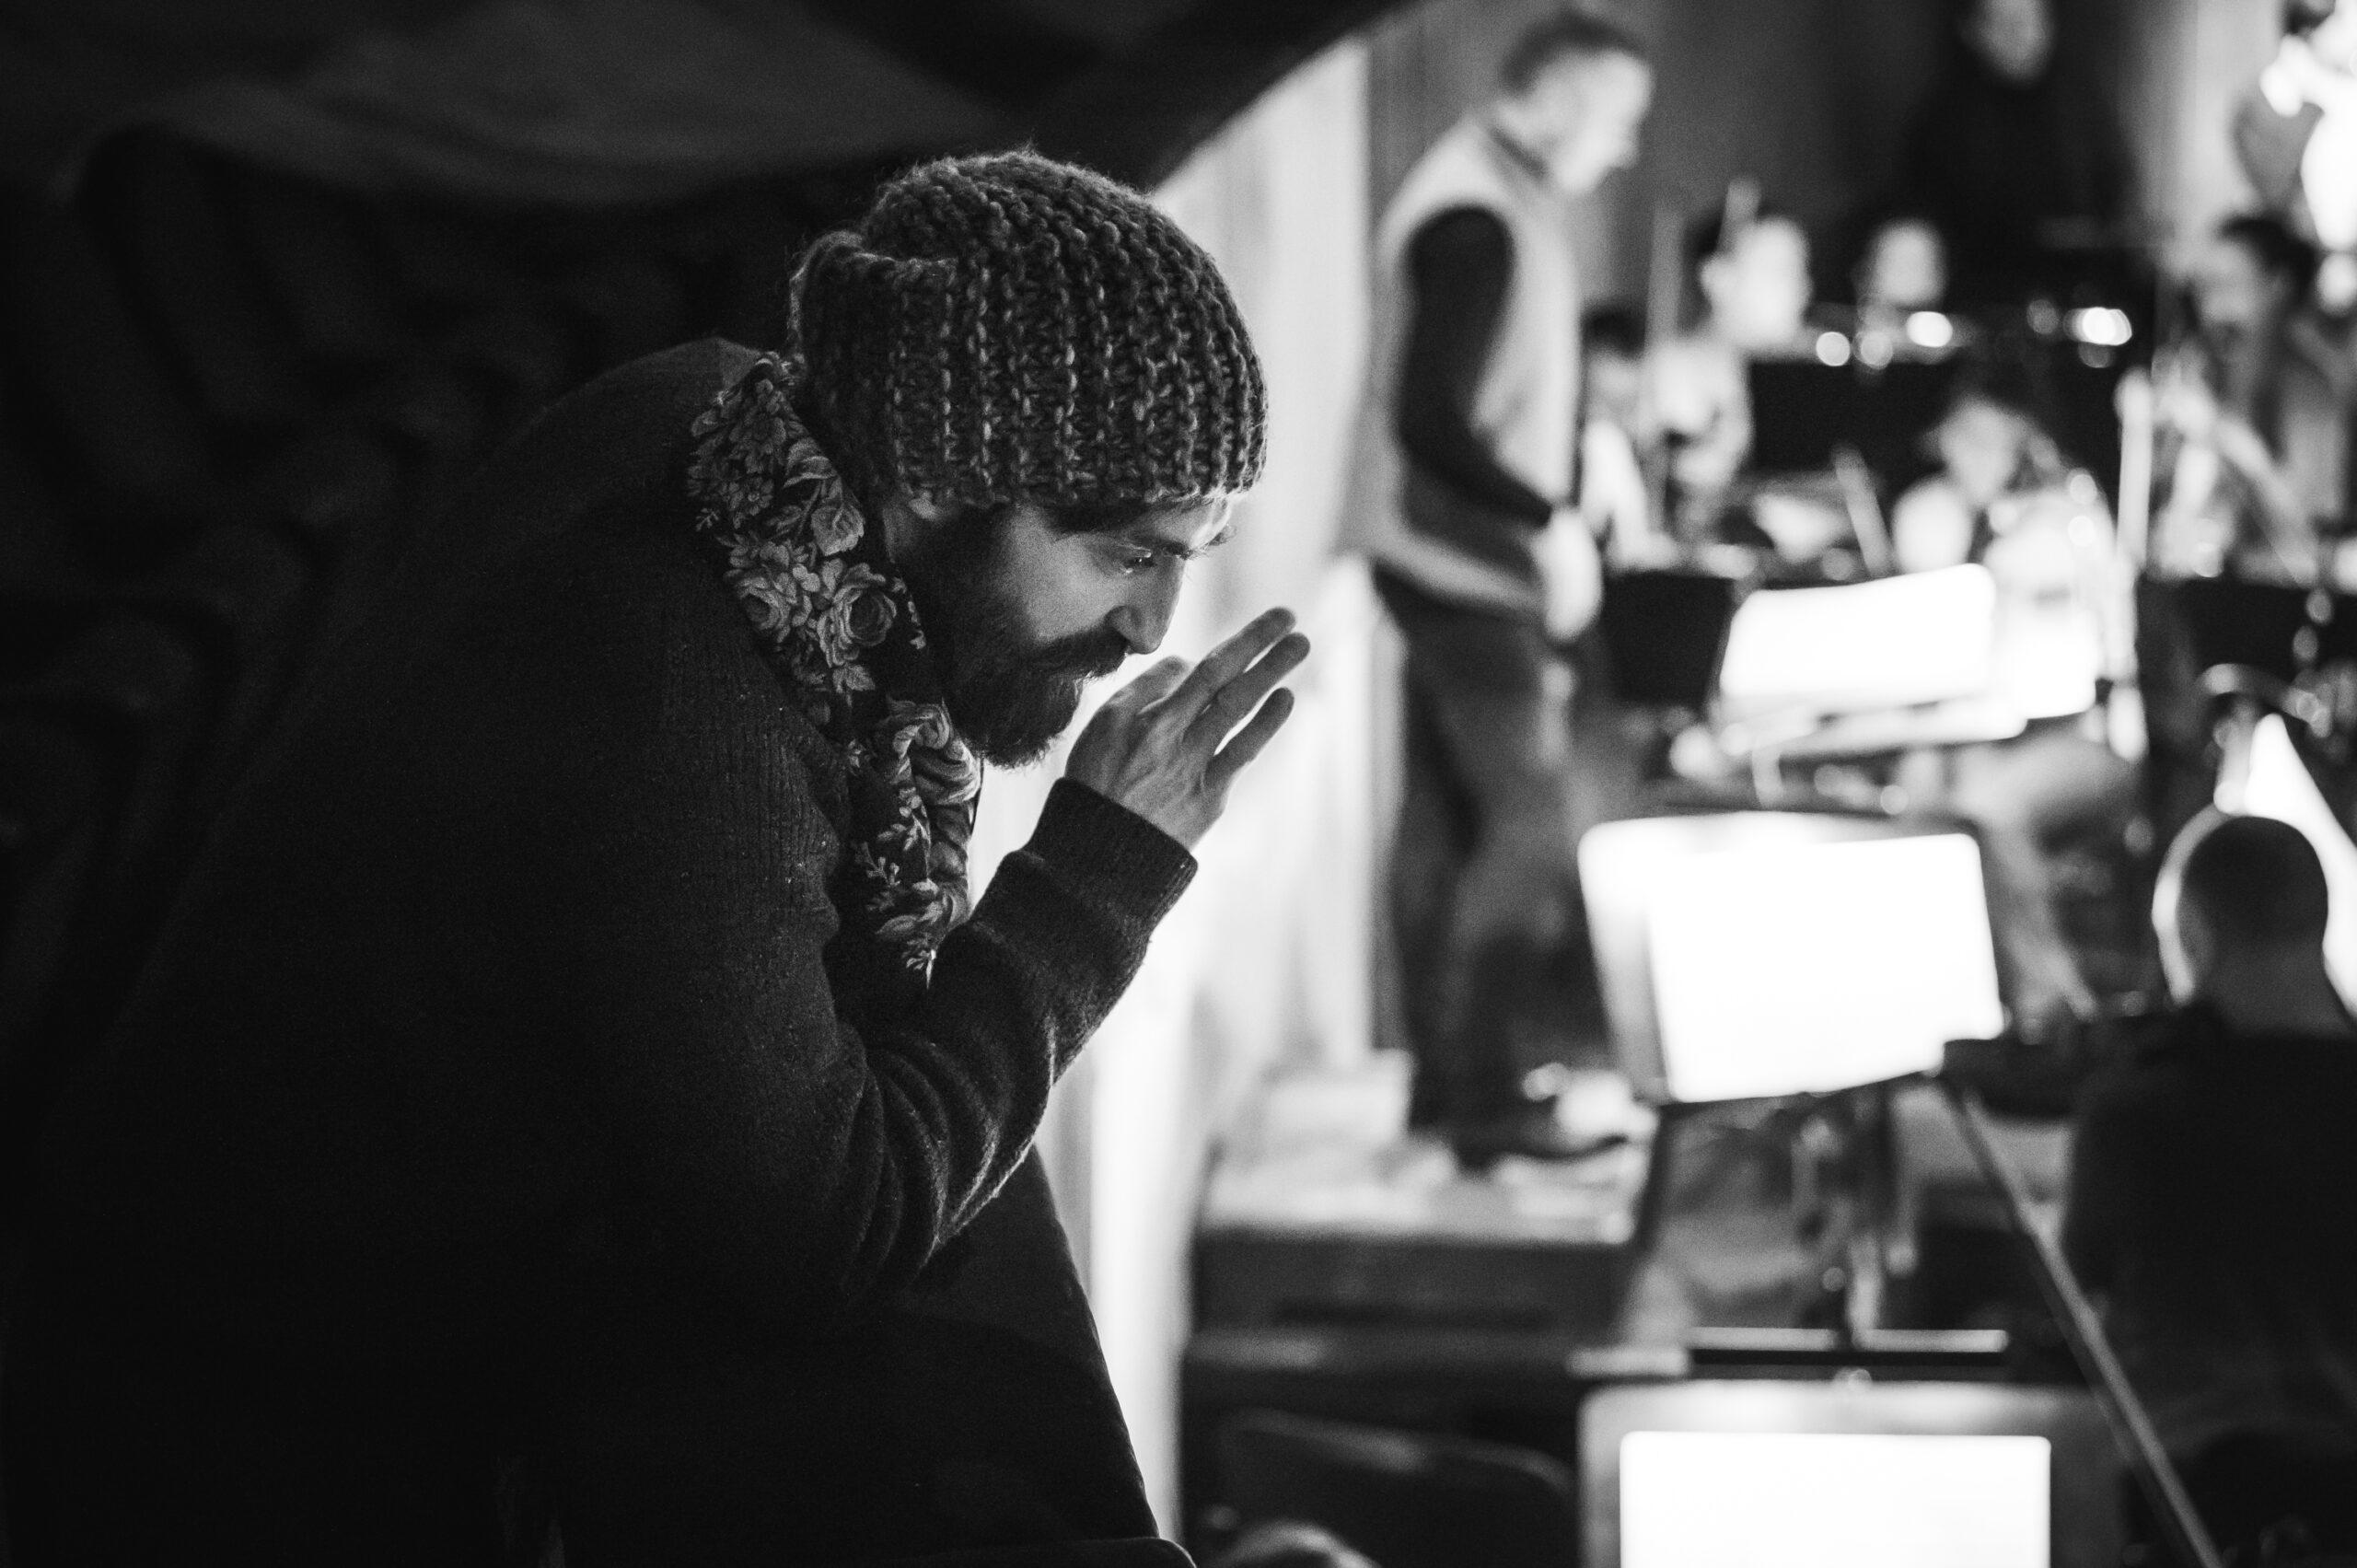 Марат Гацалов на репетиции. Фото - Андрей Чунтомов